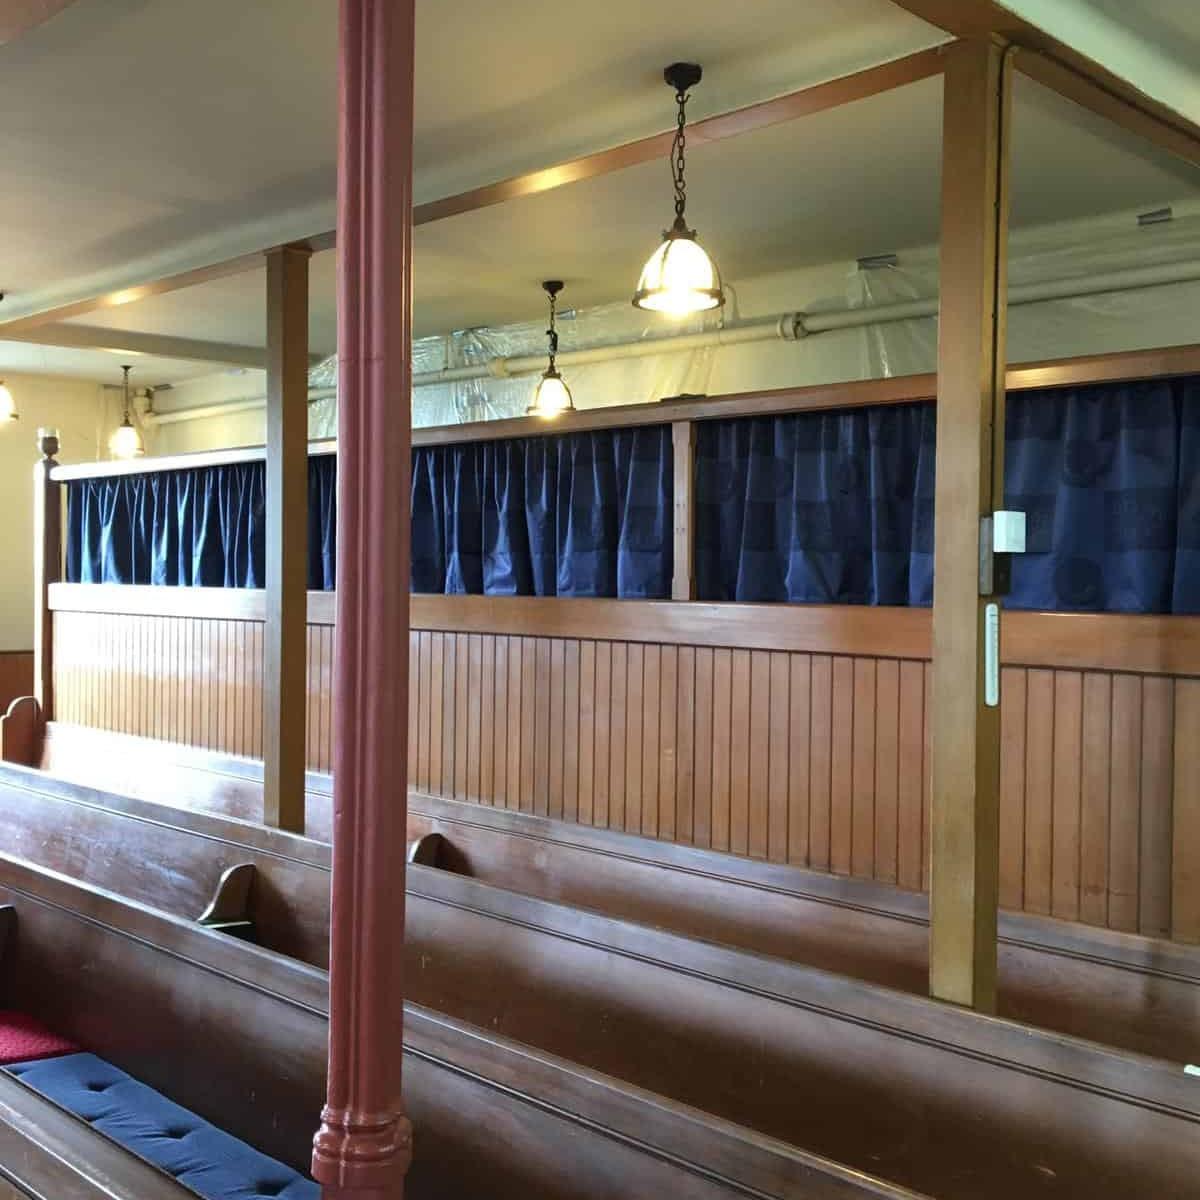 Photos from Bishopton Parish Church heating system 11